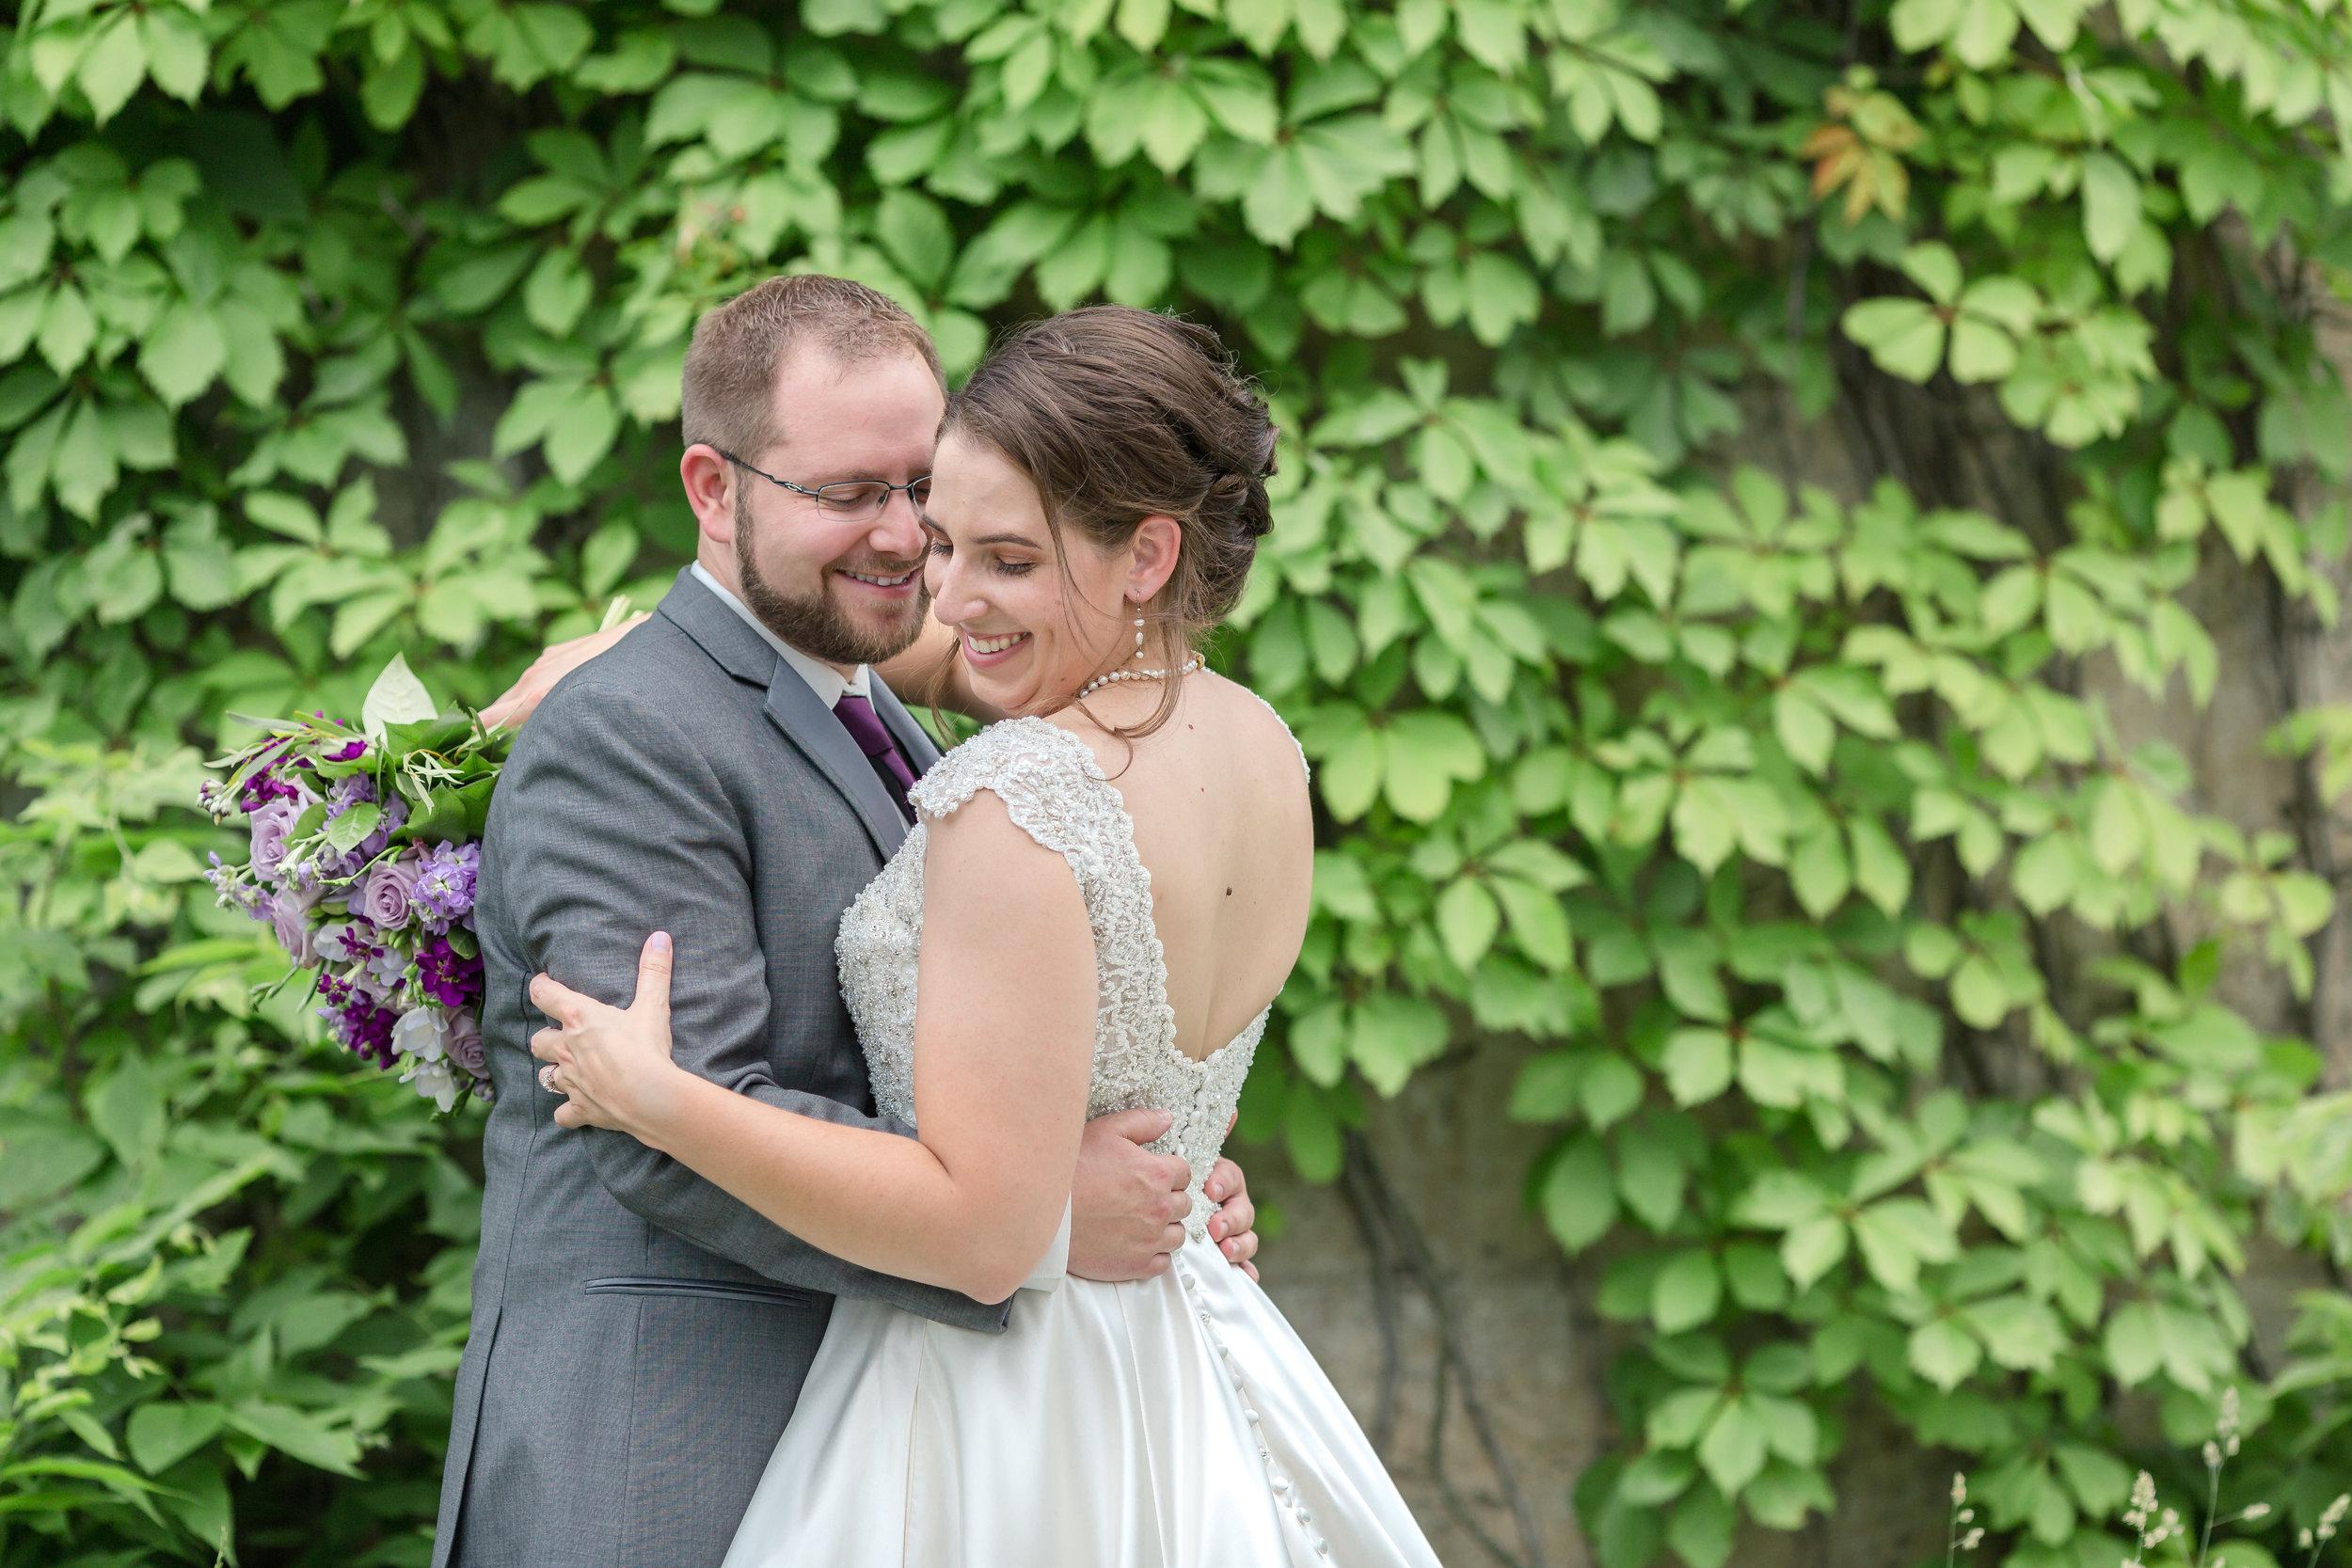 Michael & Rachel Married Portfolio - 0010.jpg